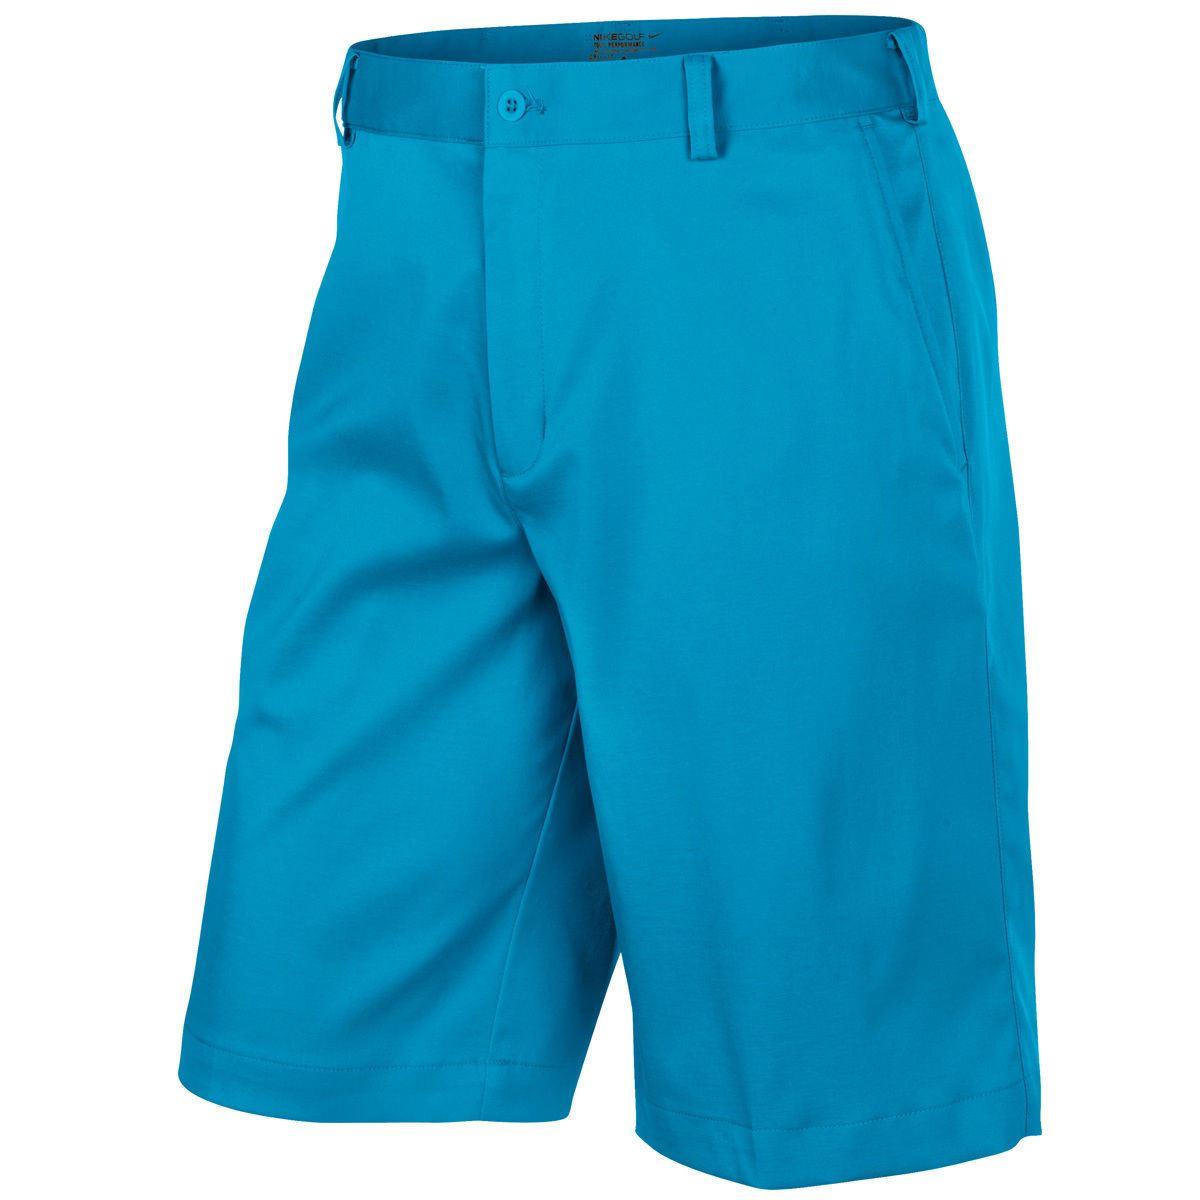 SALE!! 2014 Nike Flat Front Tech Mens Funky Golf Shorts | eBay